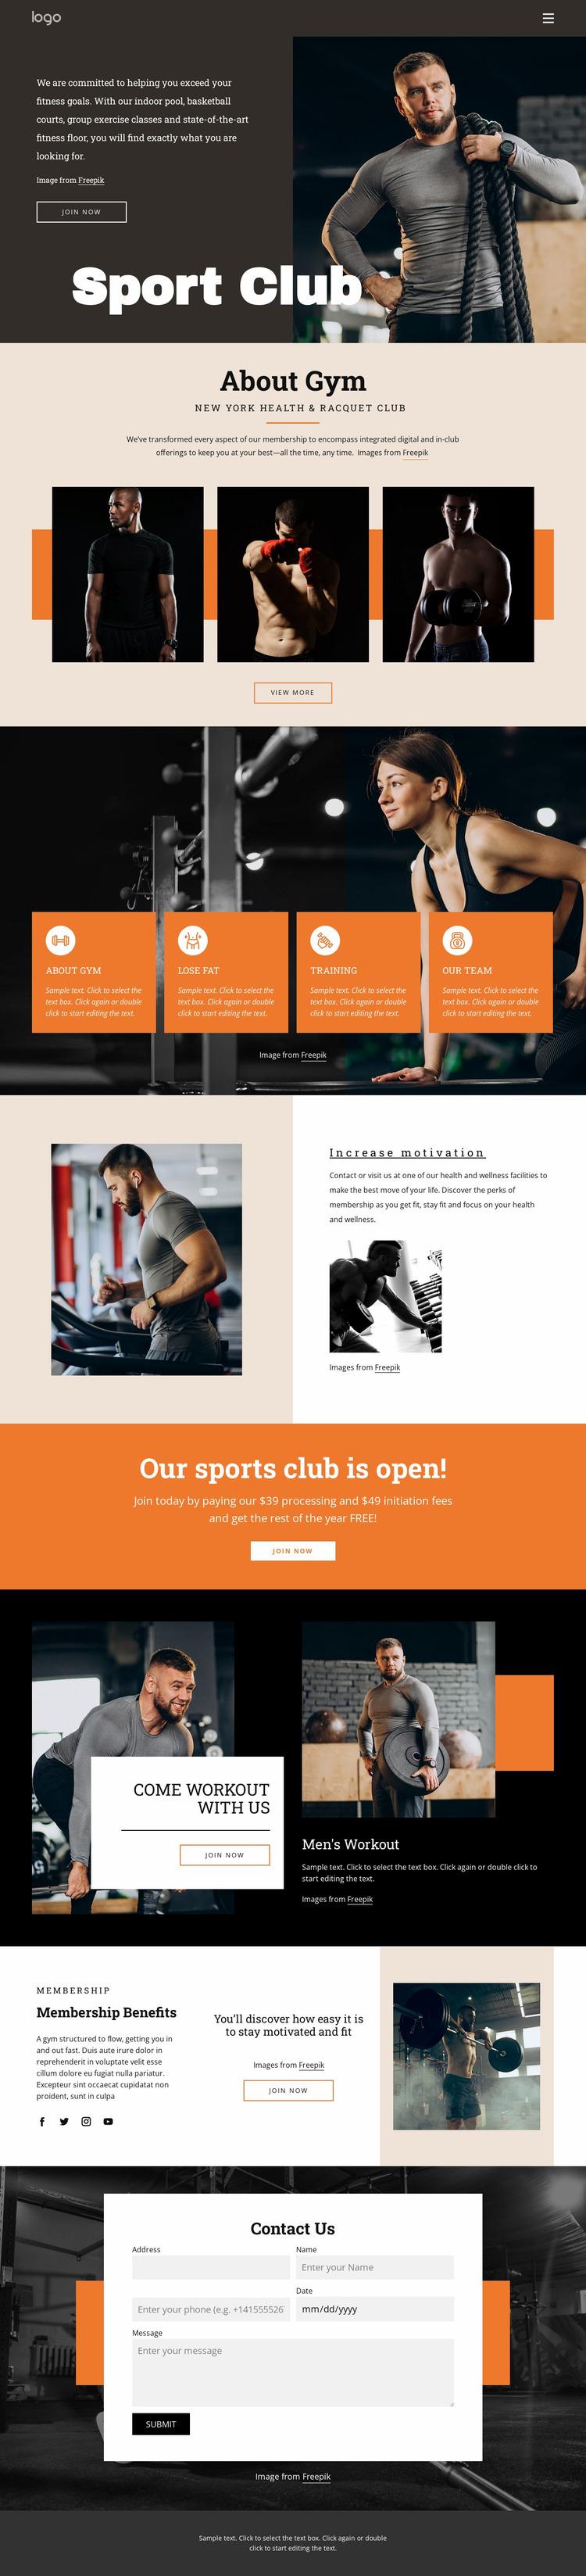 Convenient personal training programs Website Mockup